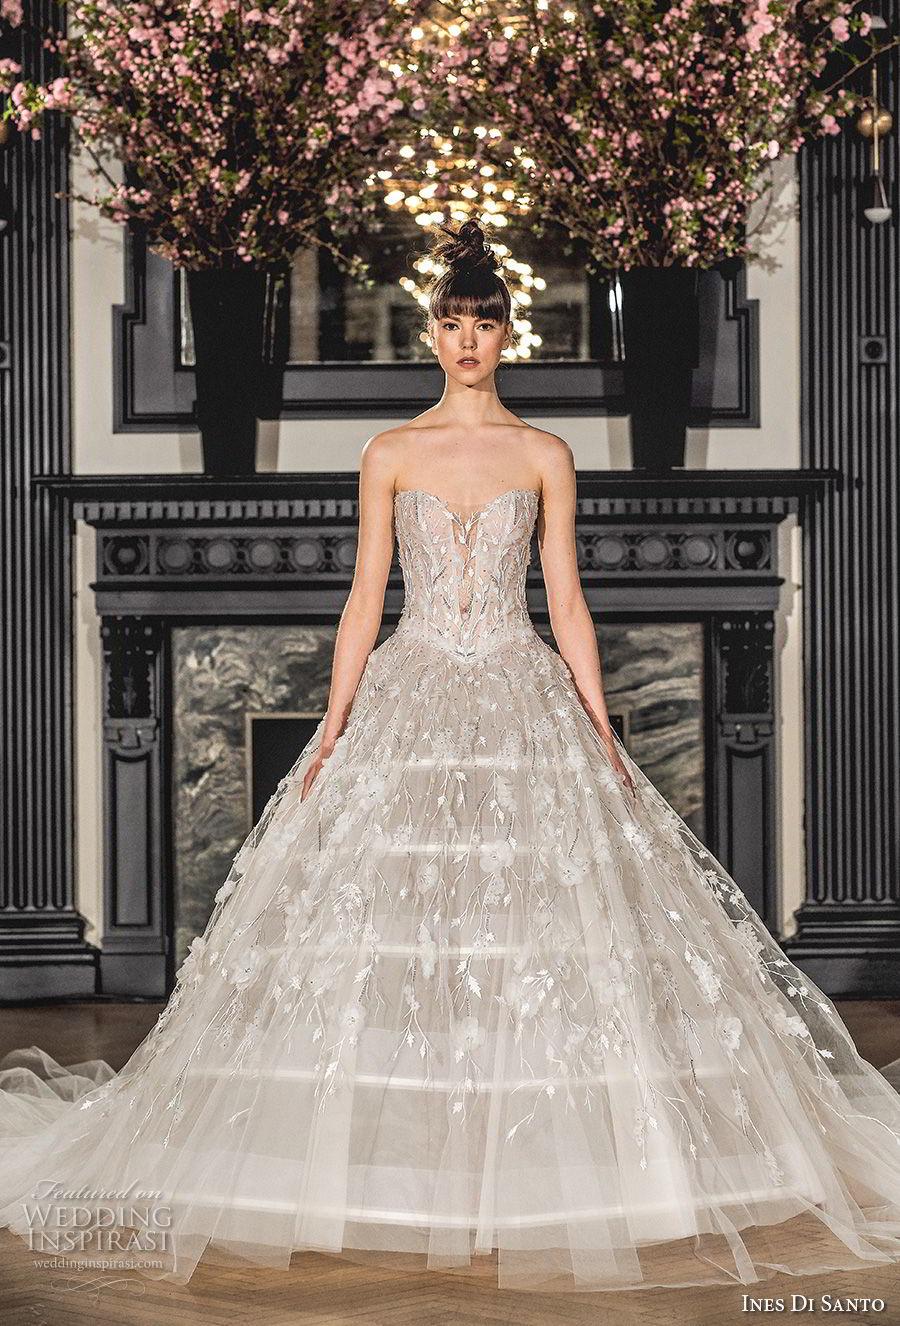 Ines di santo spring 2019 wedding dresses modern A line wedding dress 2019